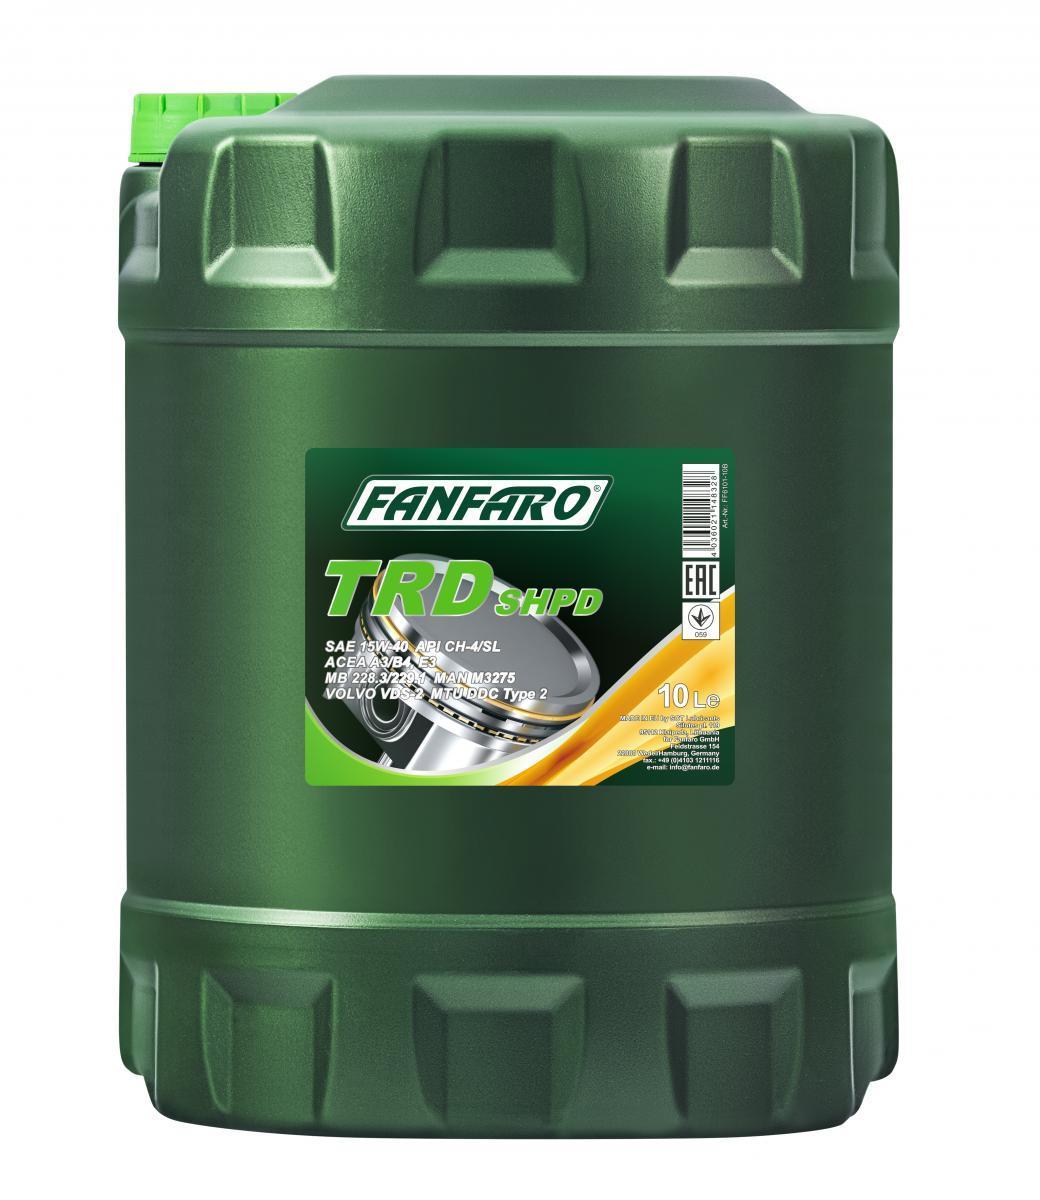 FANFARO SHPD, TRD FF6101-10 Motoröl